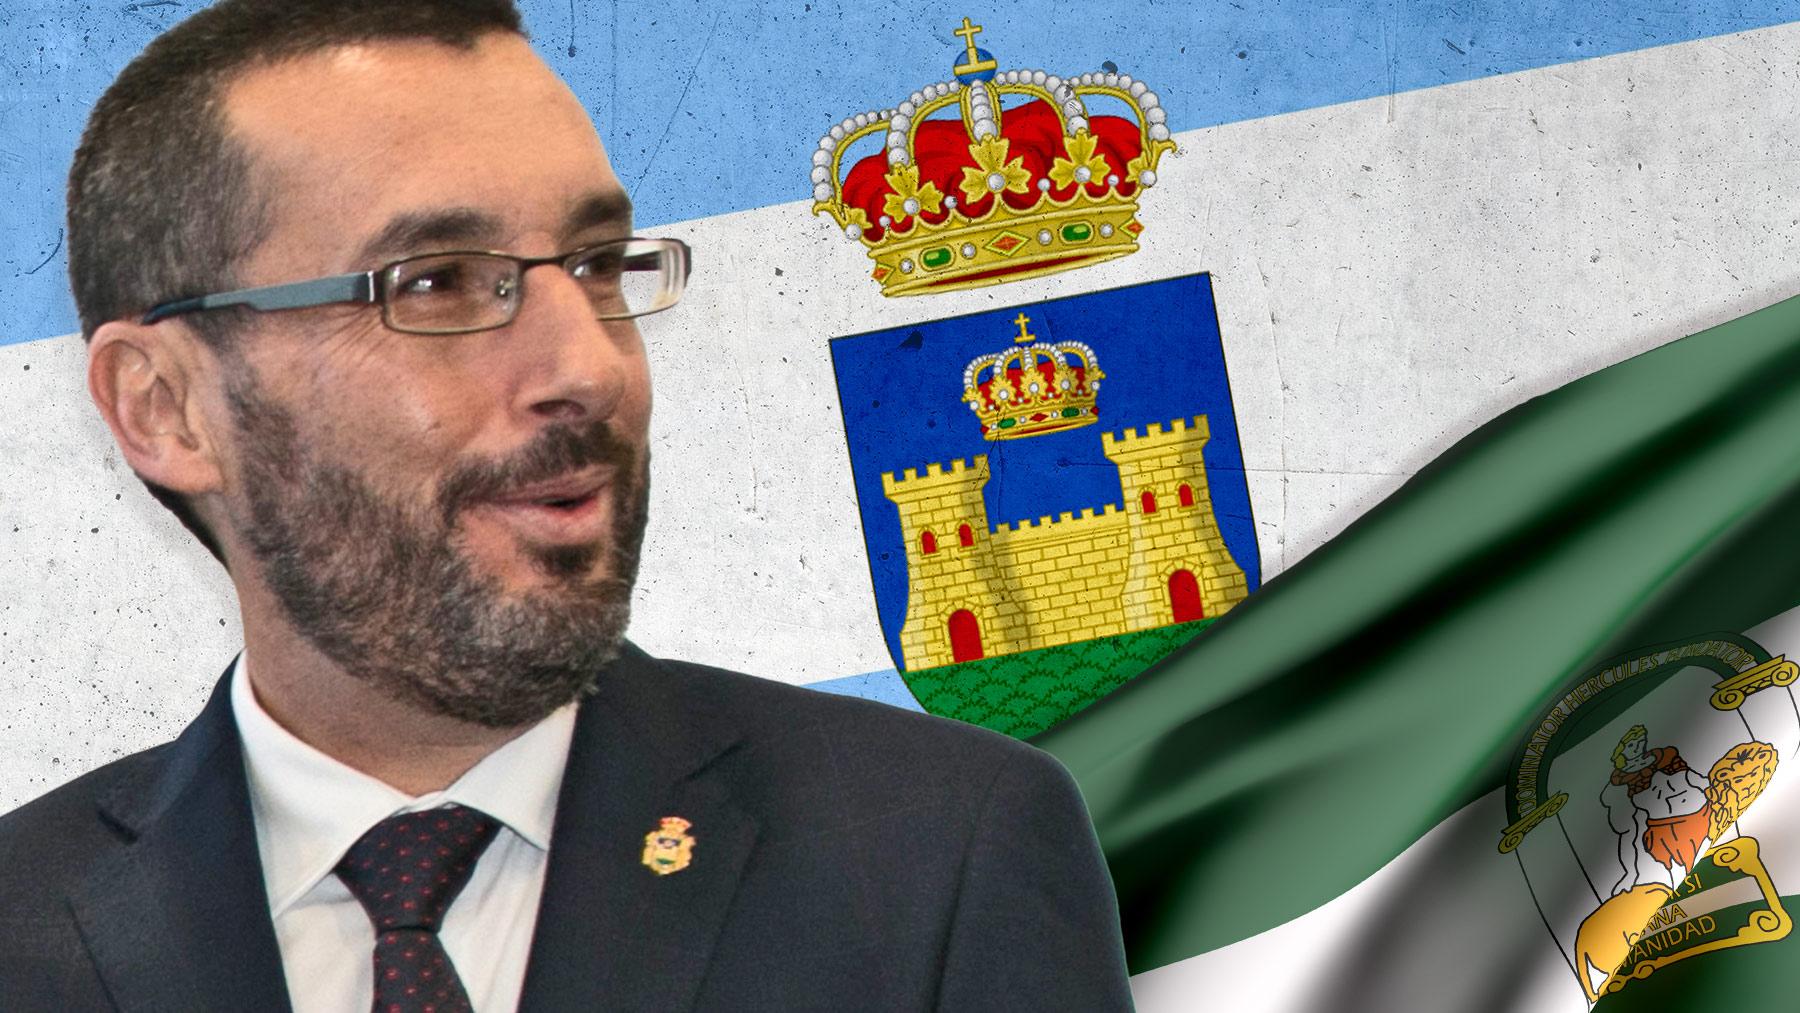 La Línea de la Concepción (Cádiz) does not want to be Andalusian and begins the process of independence